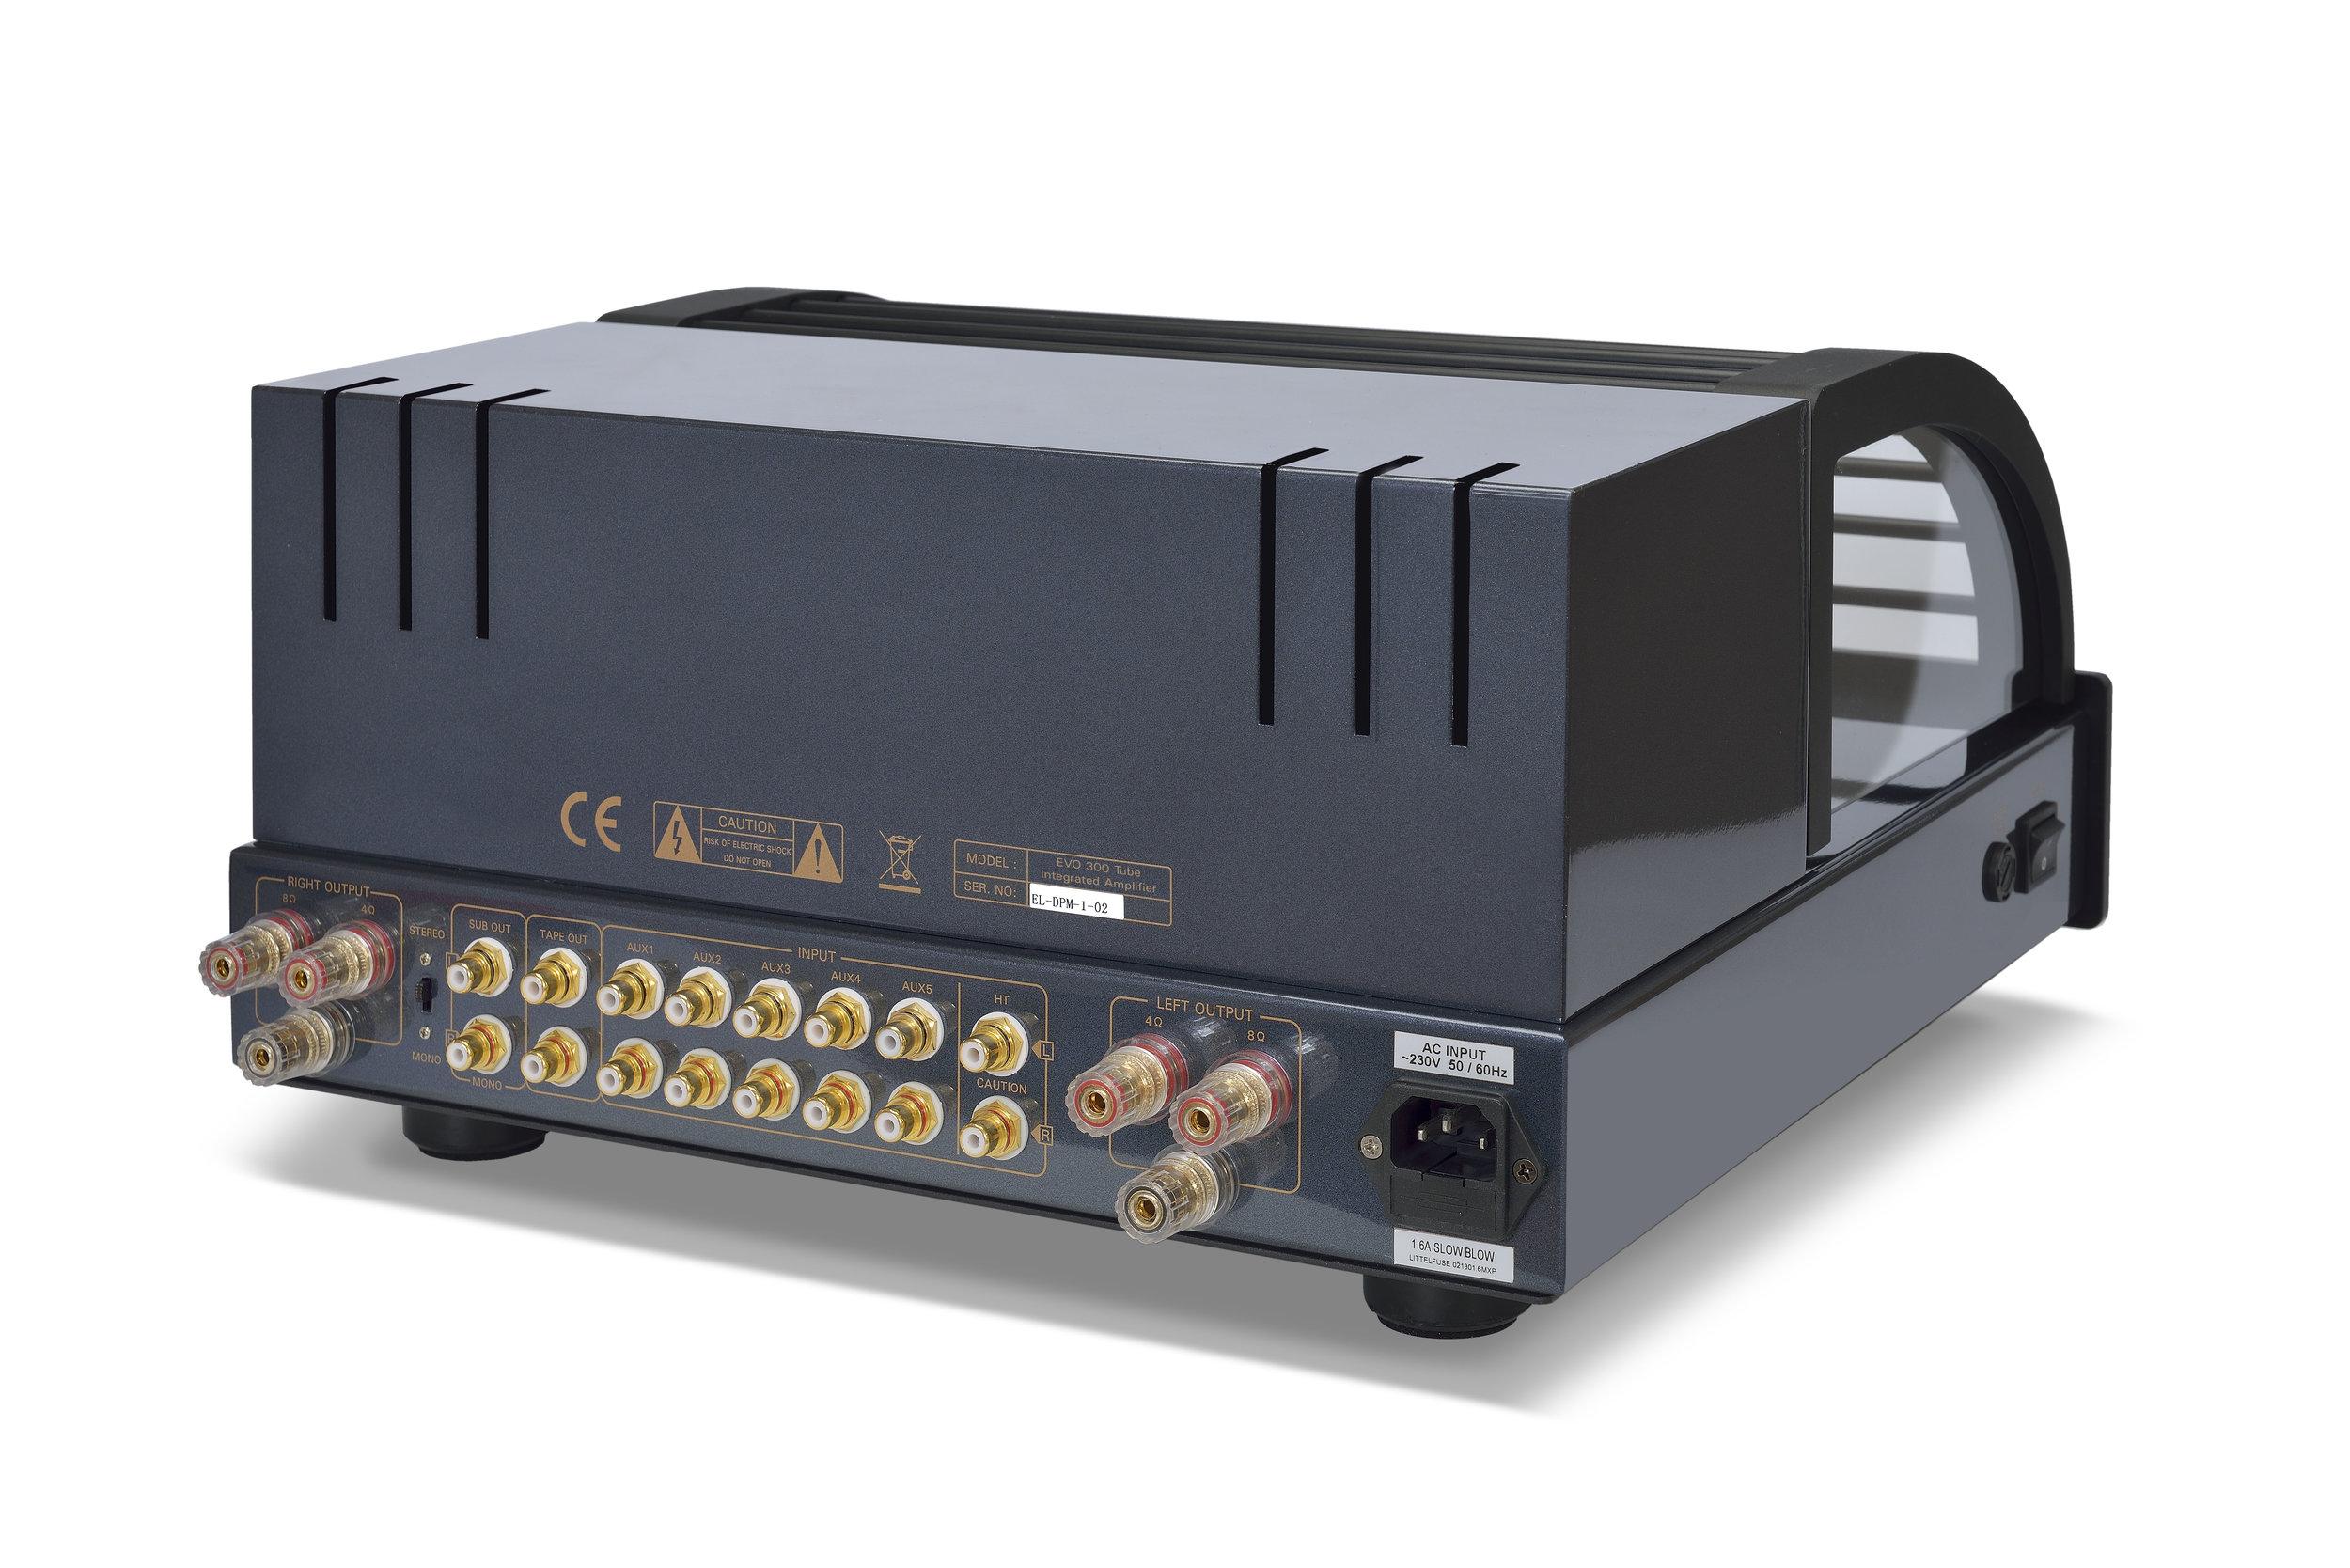 057b - PrimaLuna Evo 300 Tube Integrated Amplifier - black - back - slanted - white background.jpg